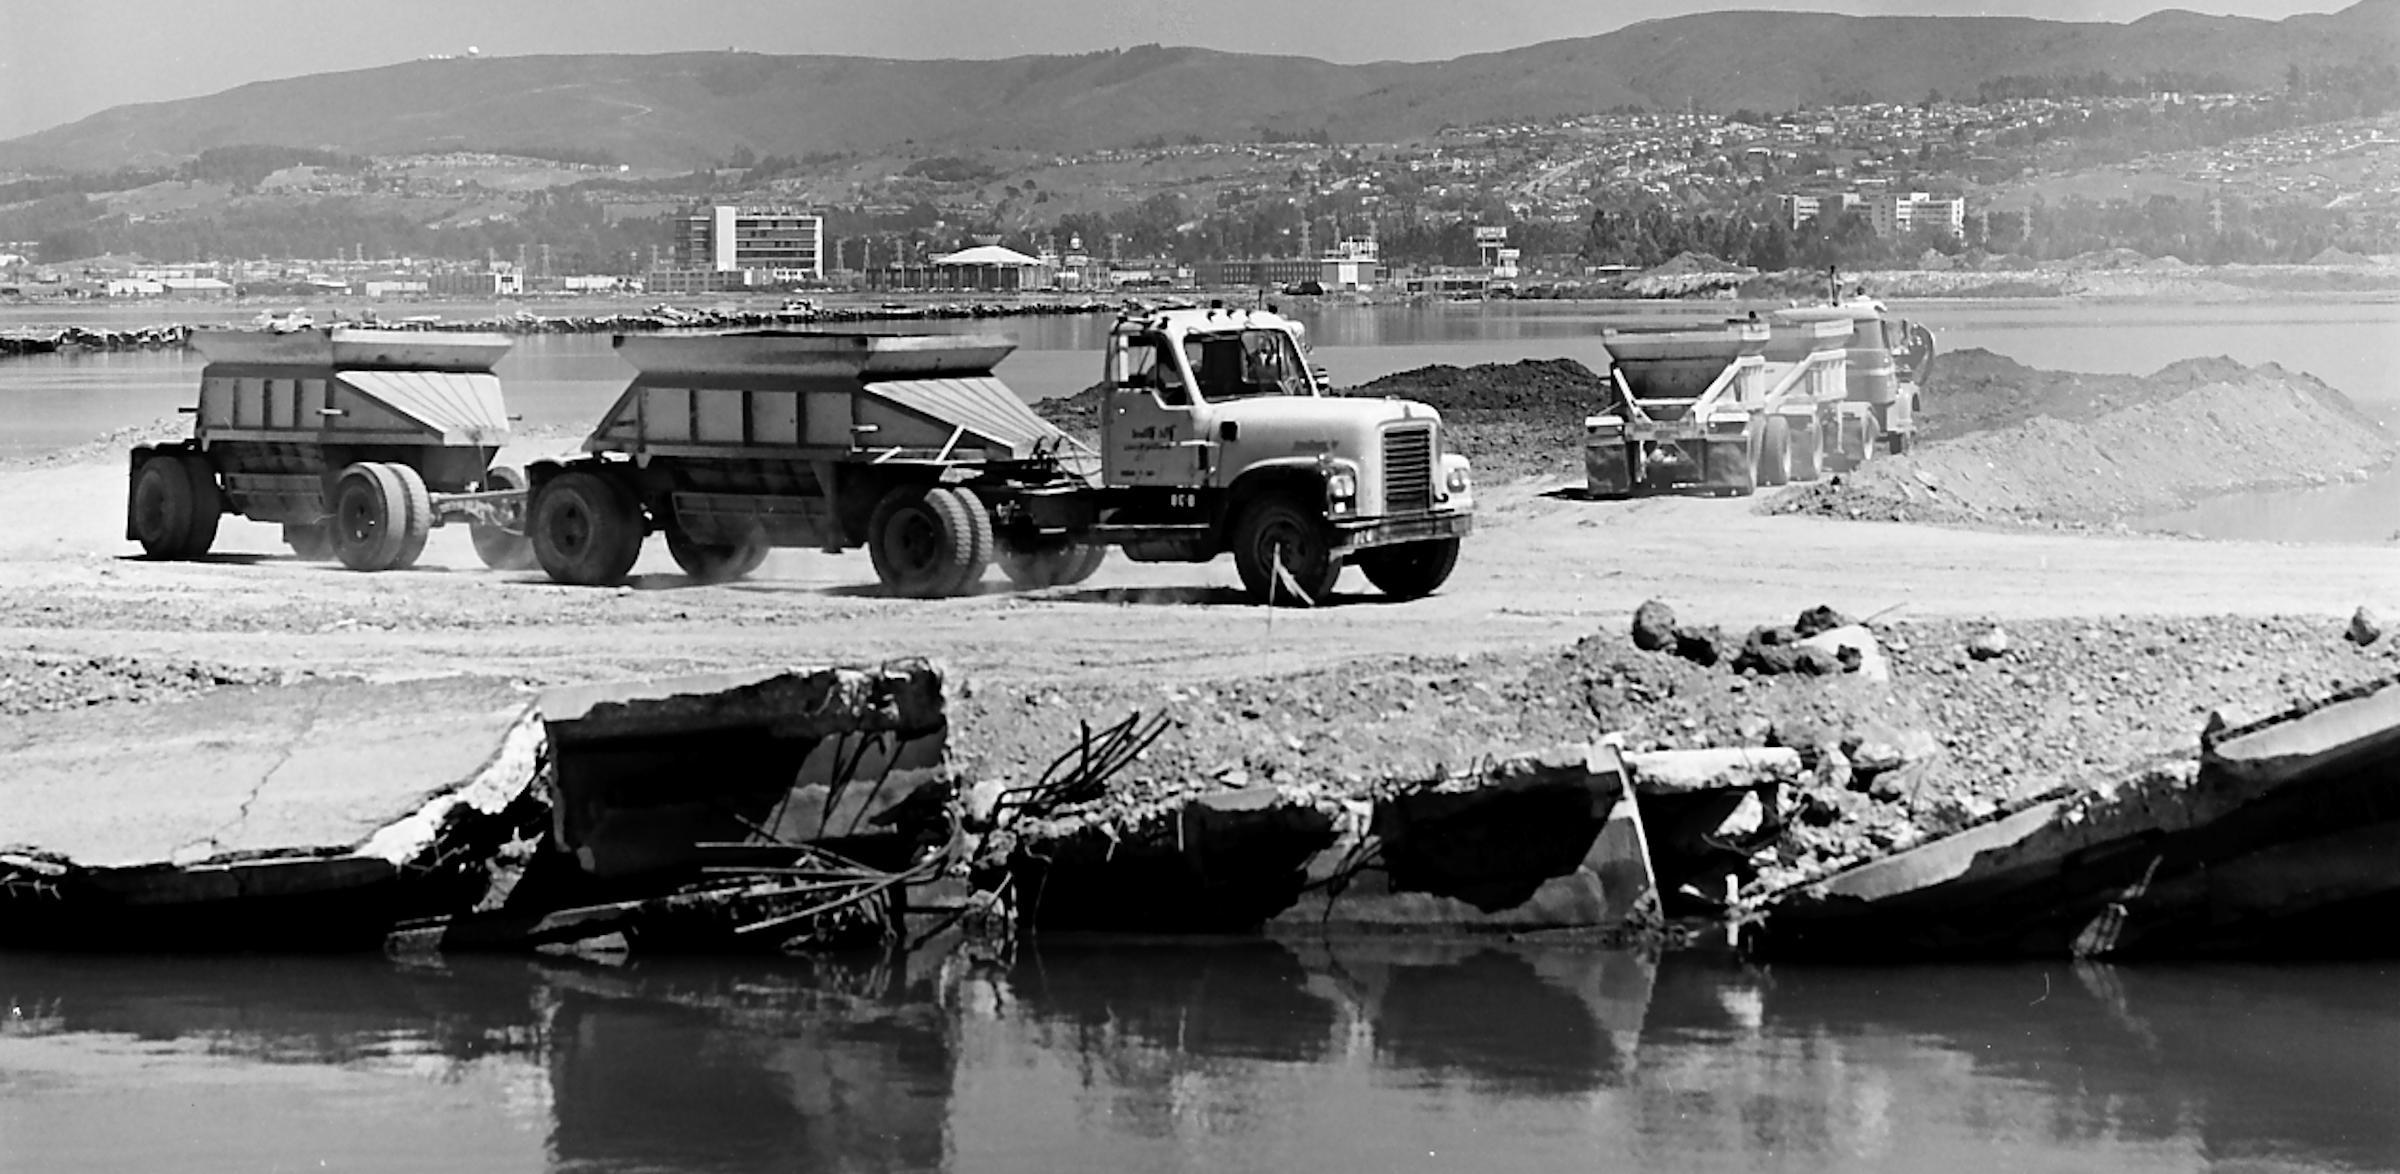 Trucks filling the bay, 1969